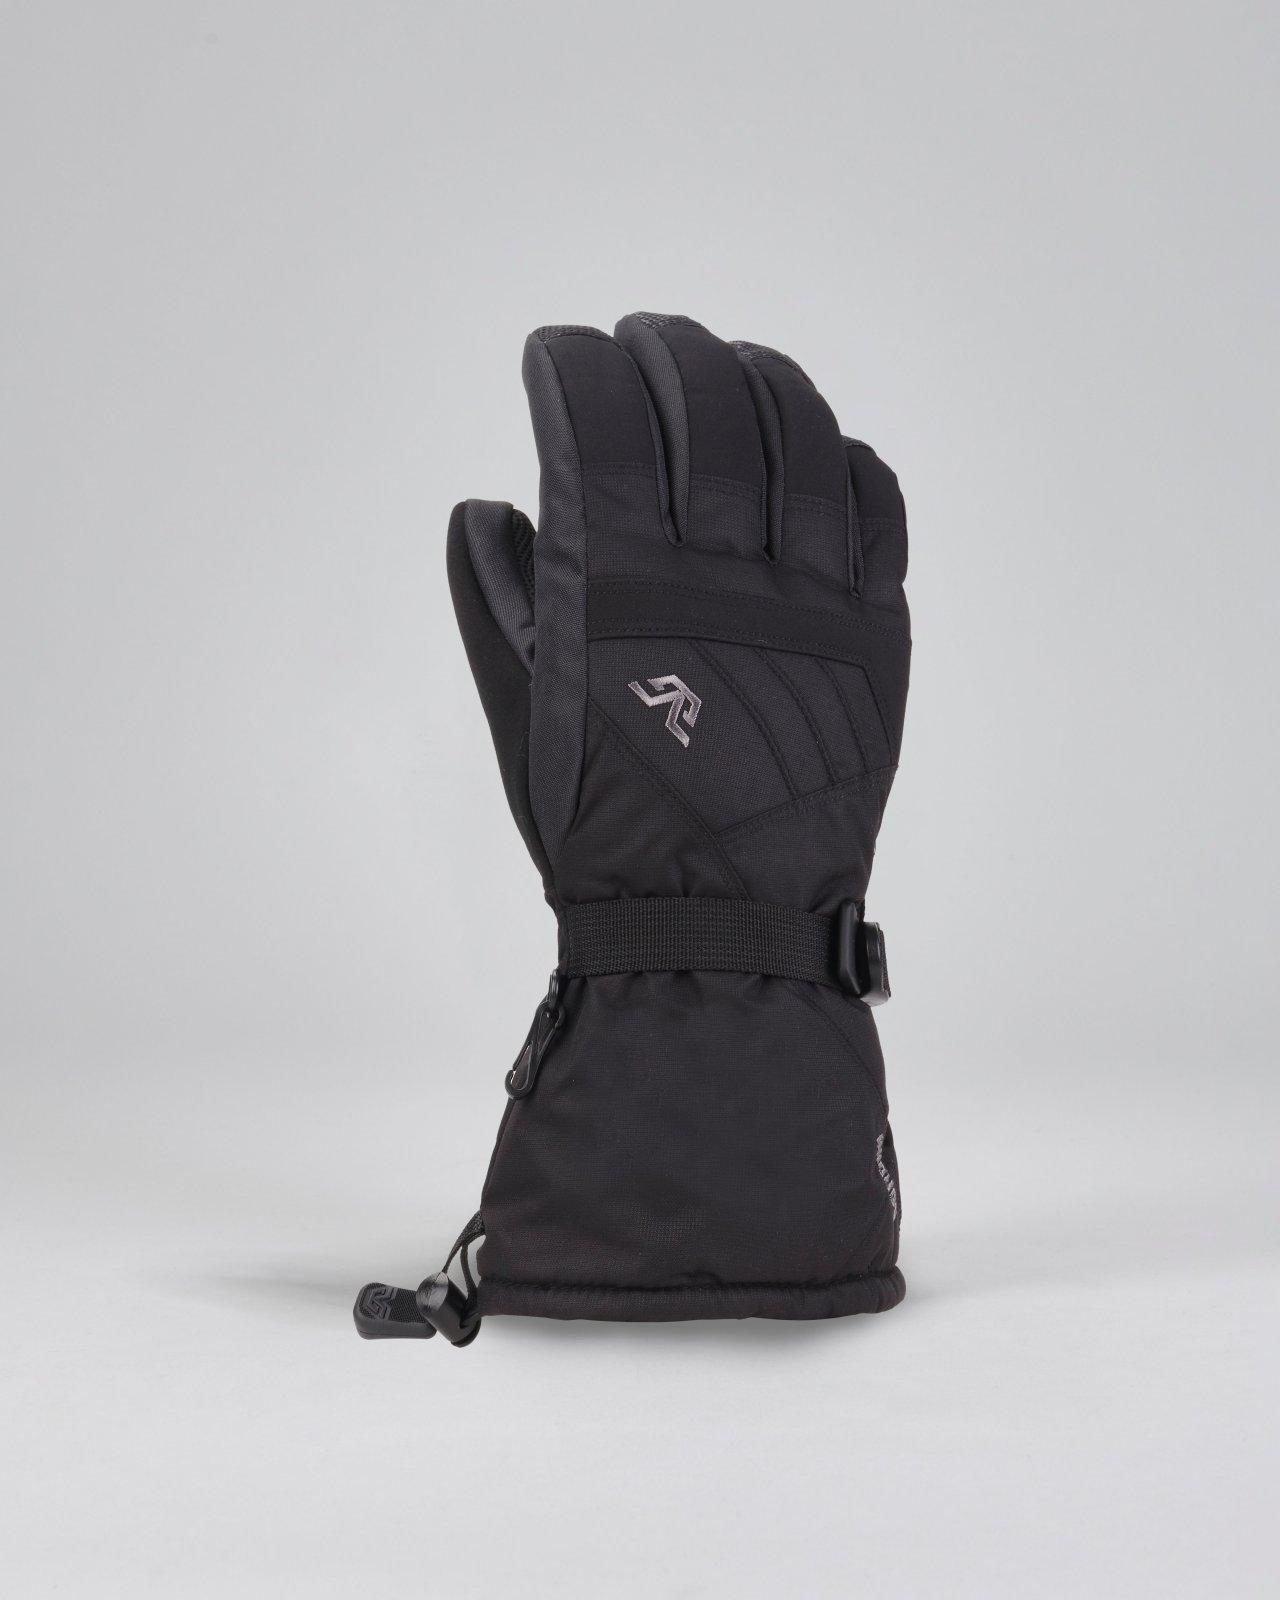 Gordini Stomp Ladies Glove